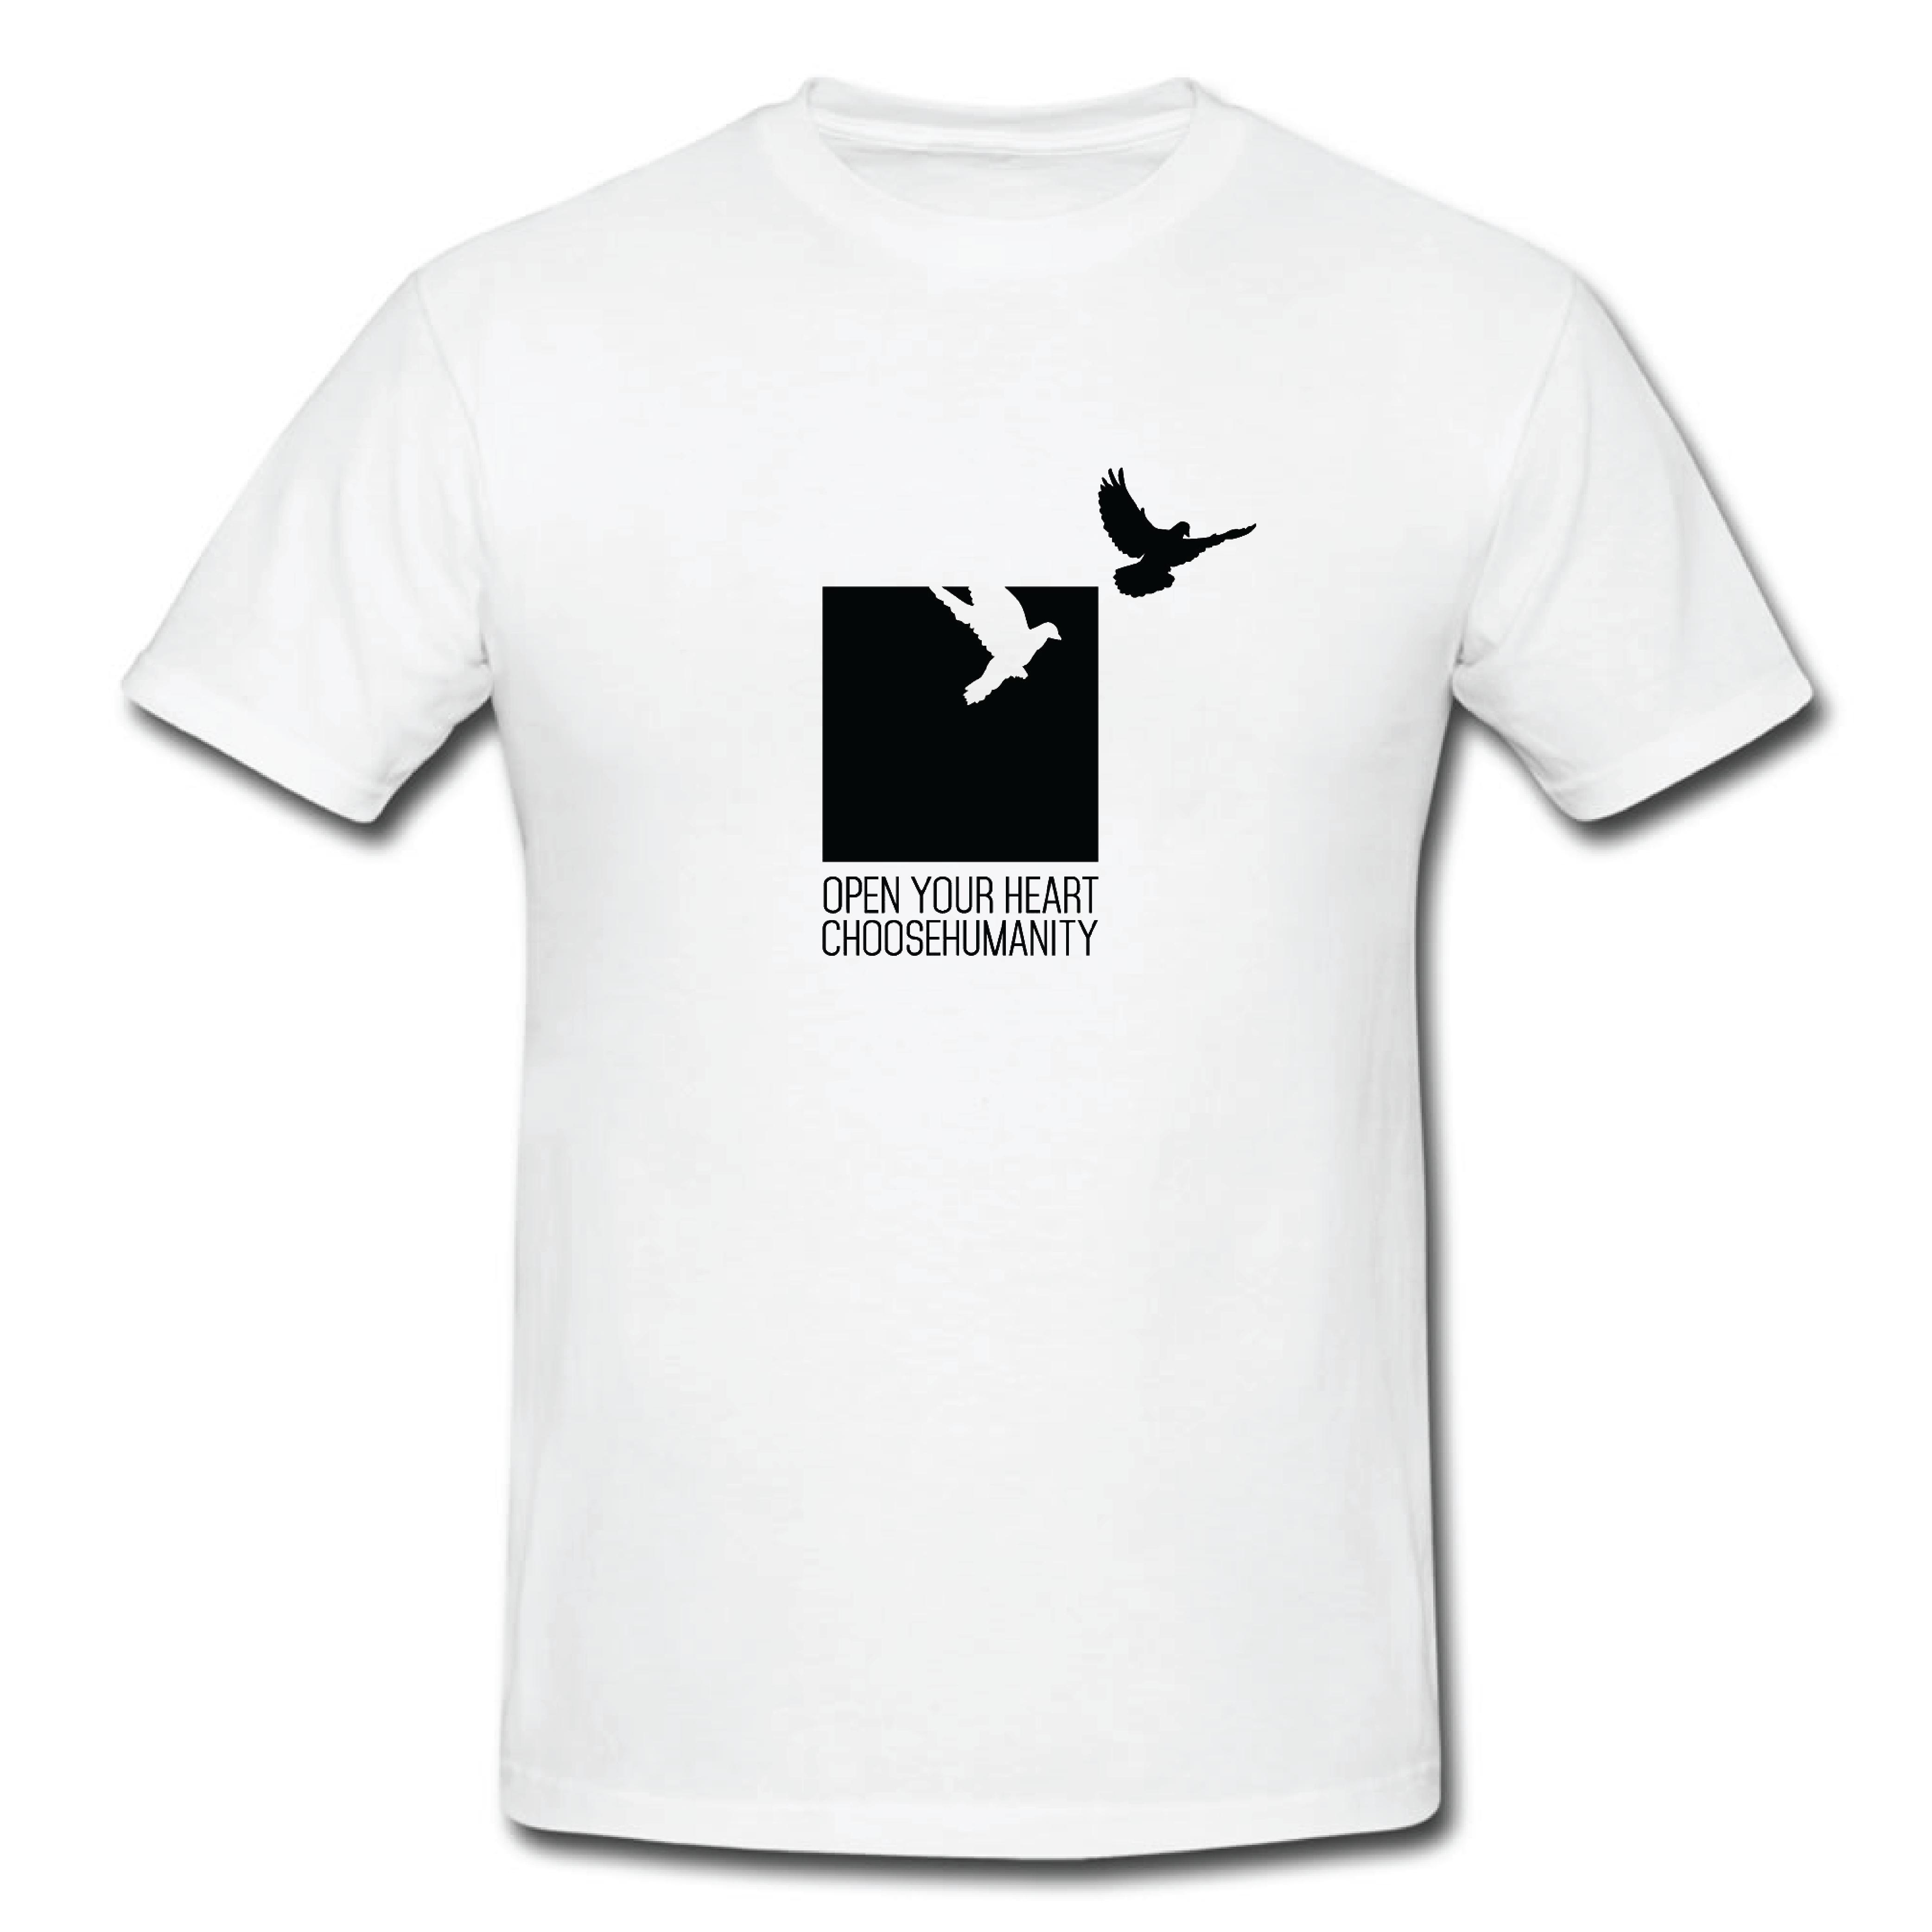 T-Shirt ChooseHumanity